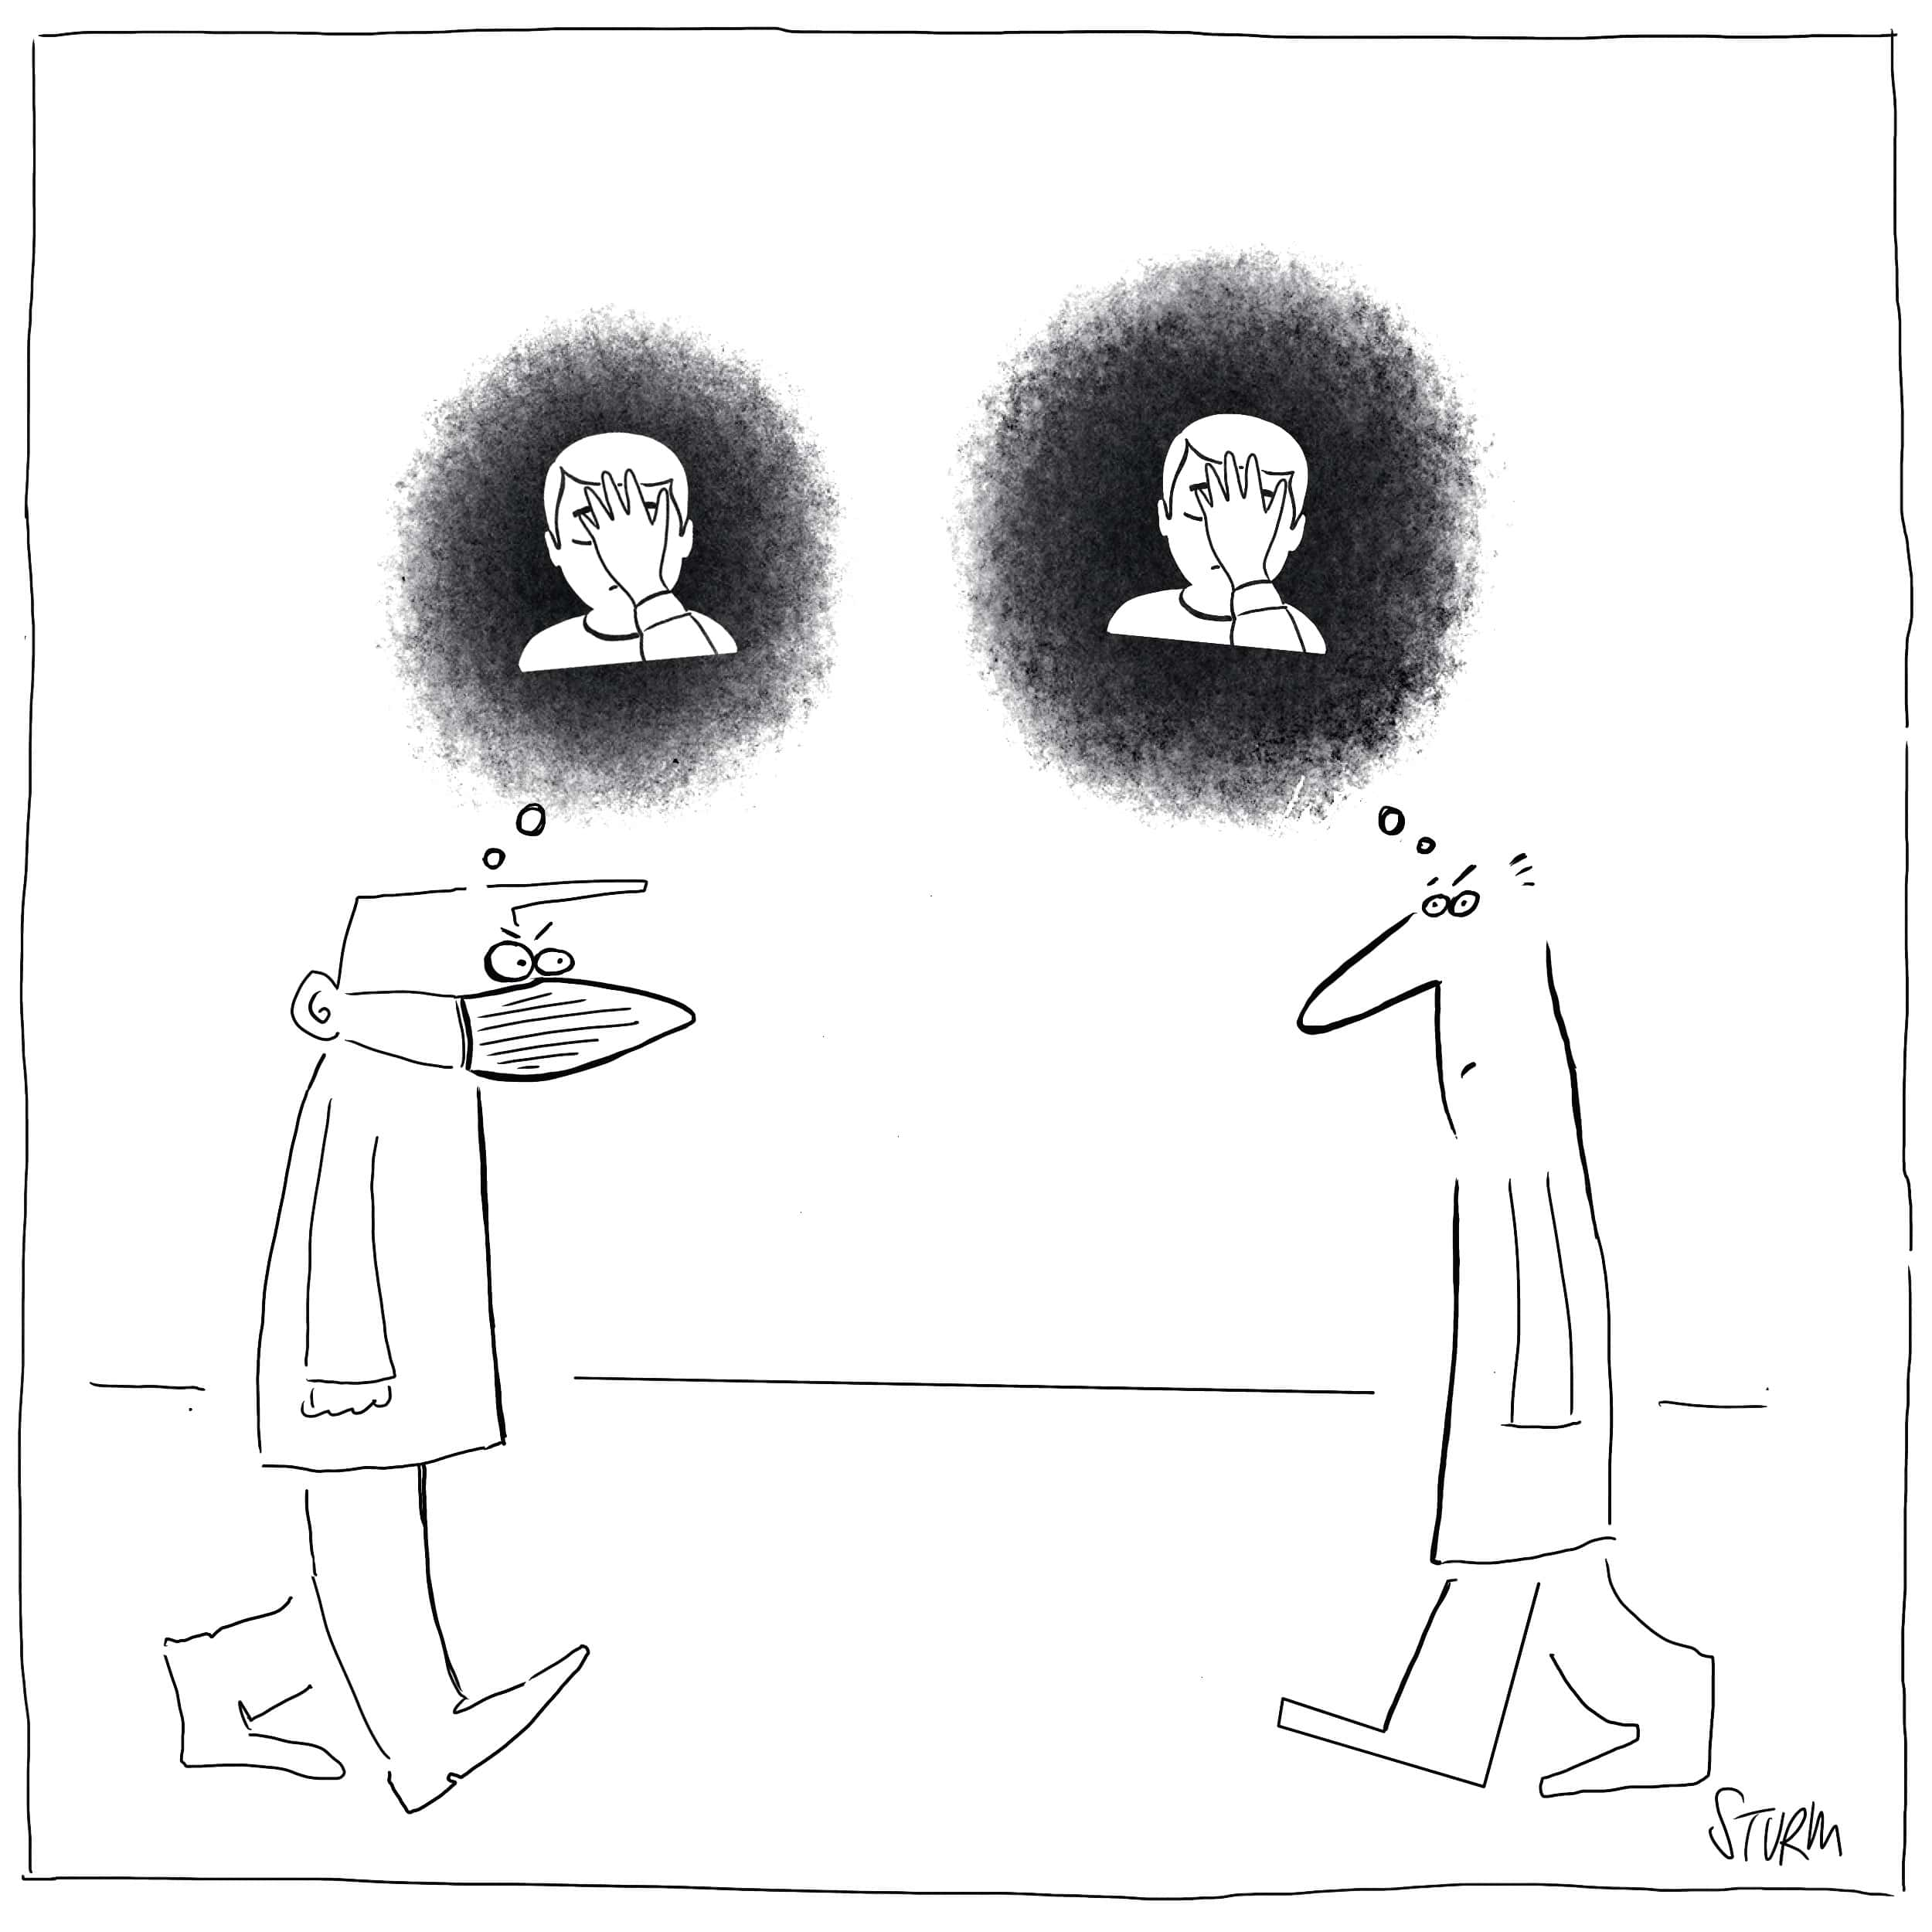 Covid Facepalm - Cartoon von Philipp Sturm